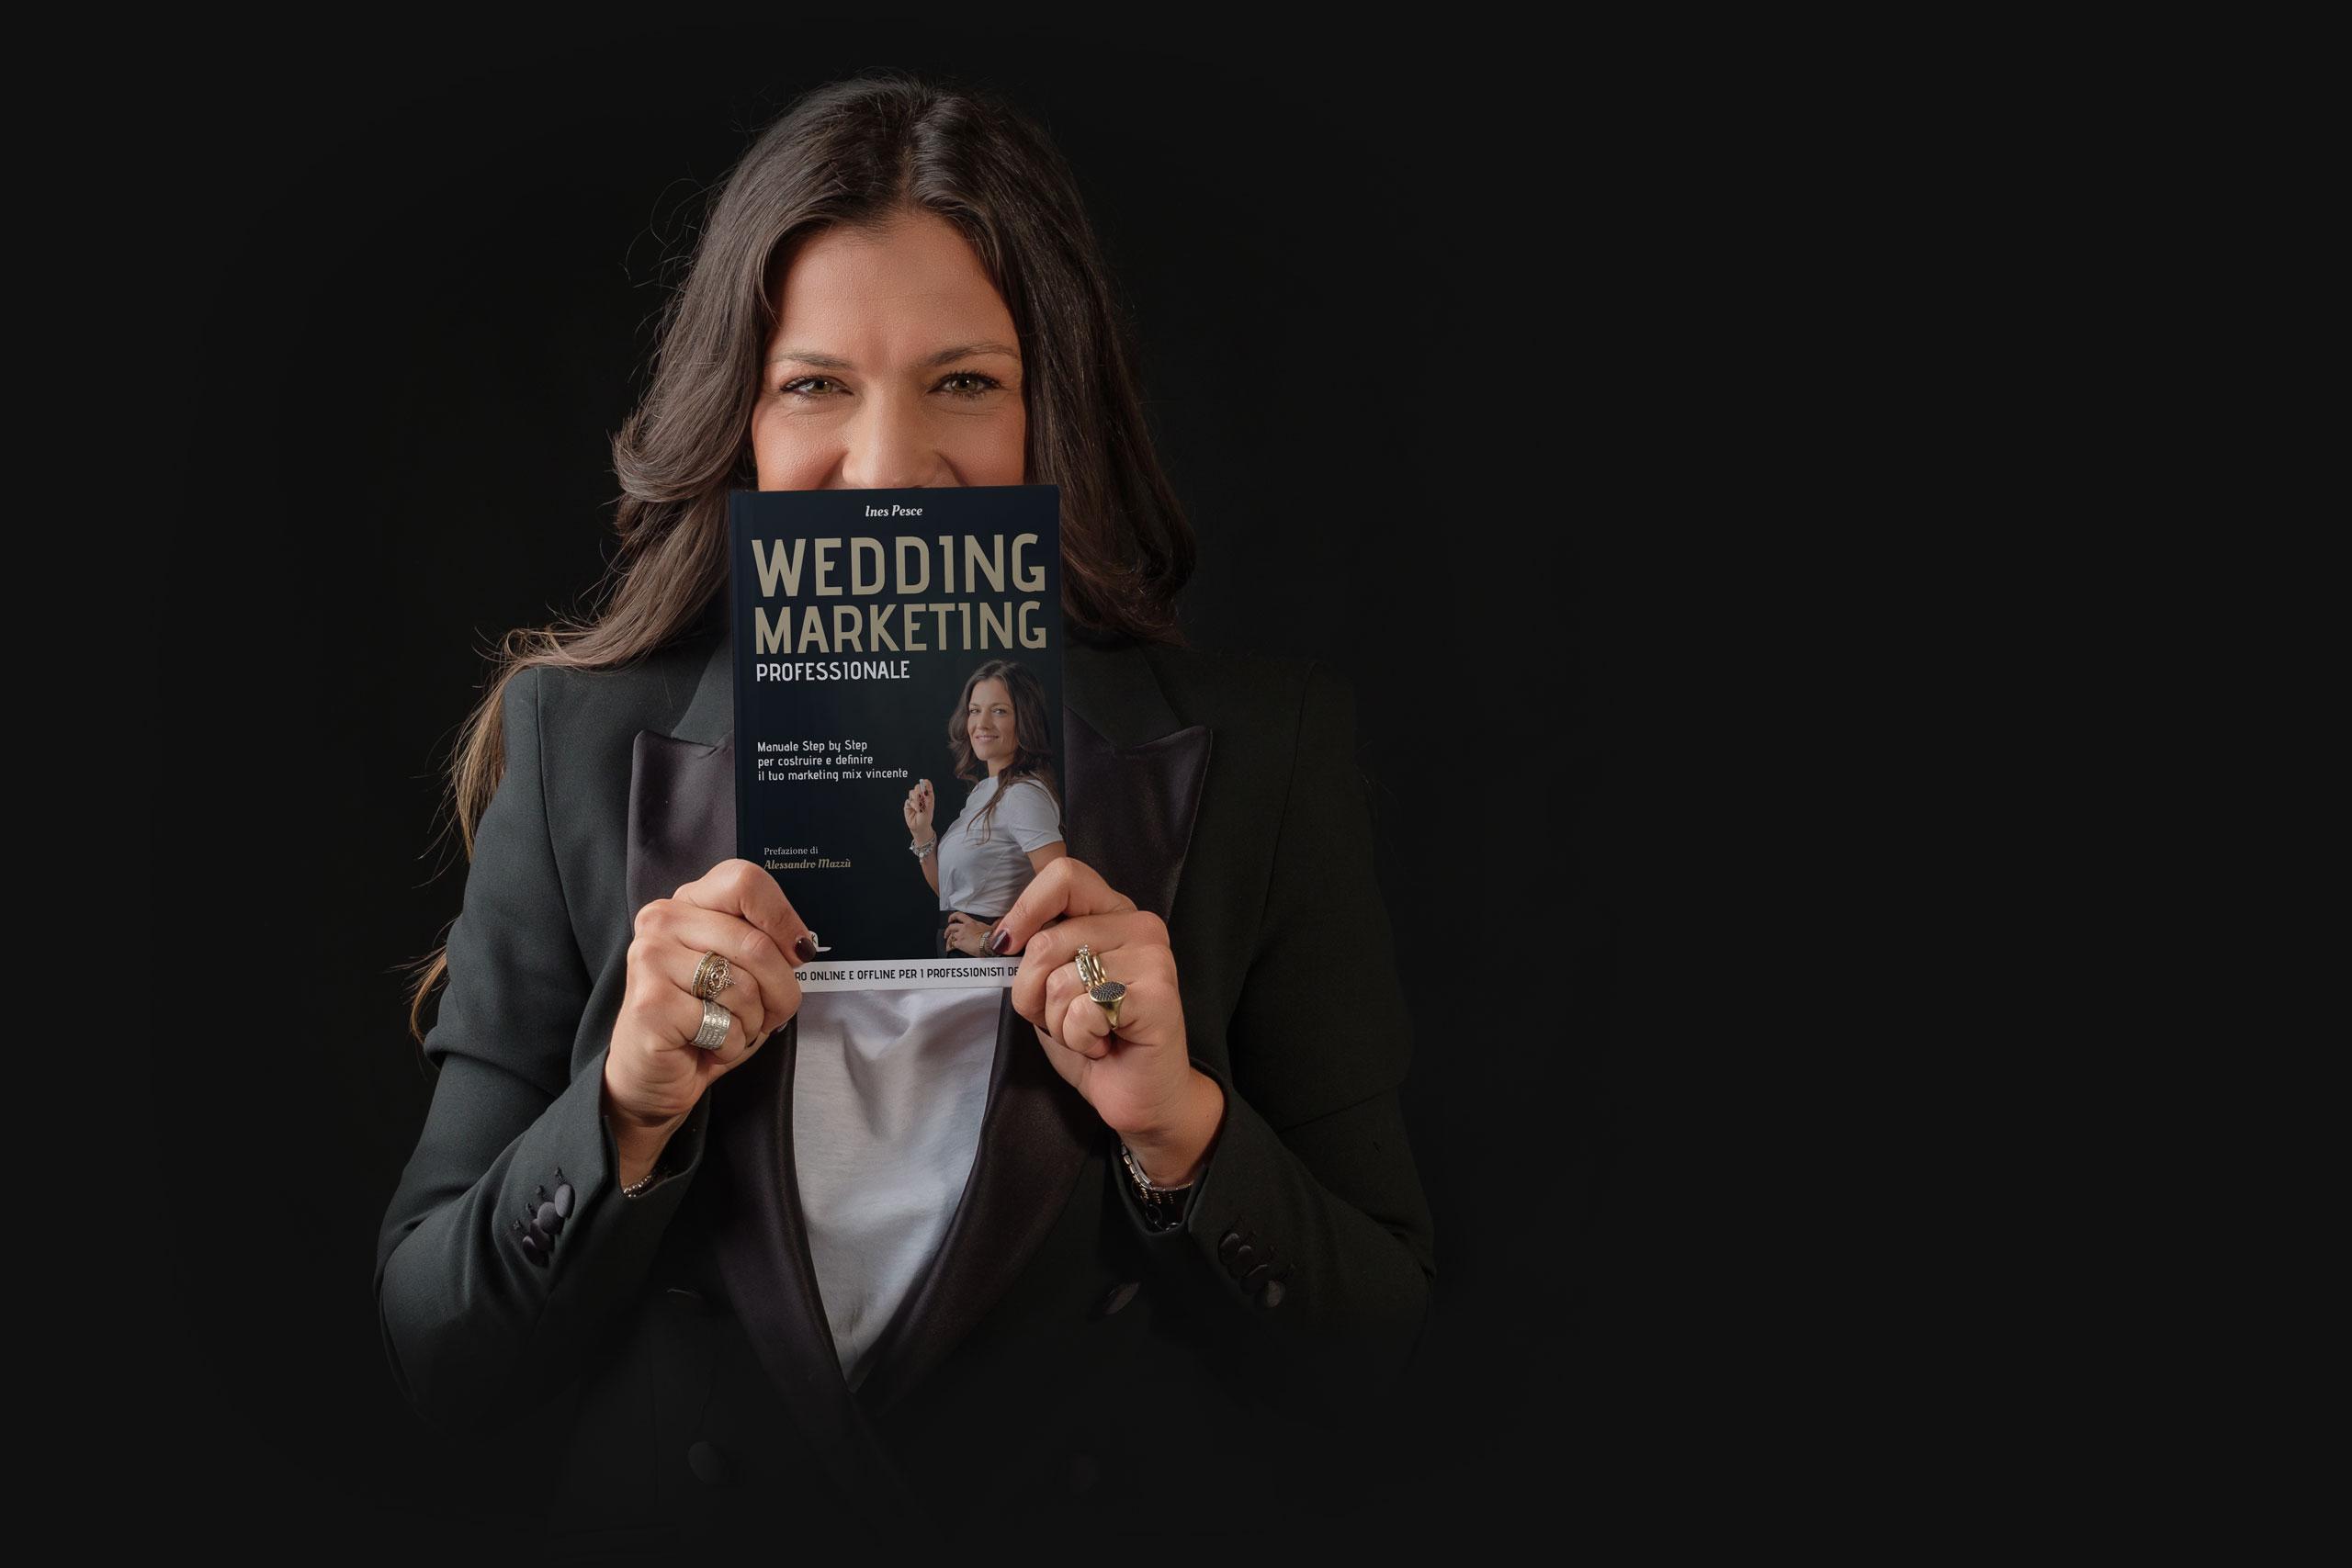 Libro di Marketing Wedding